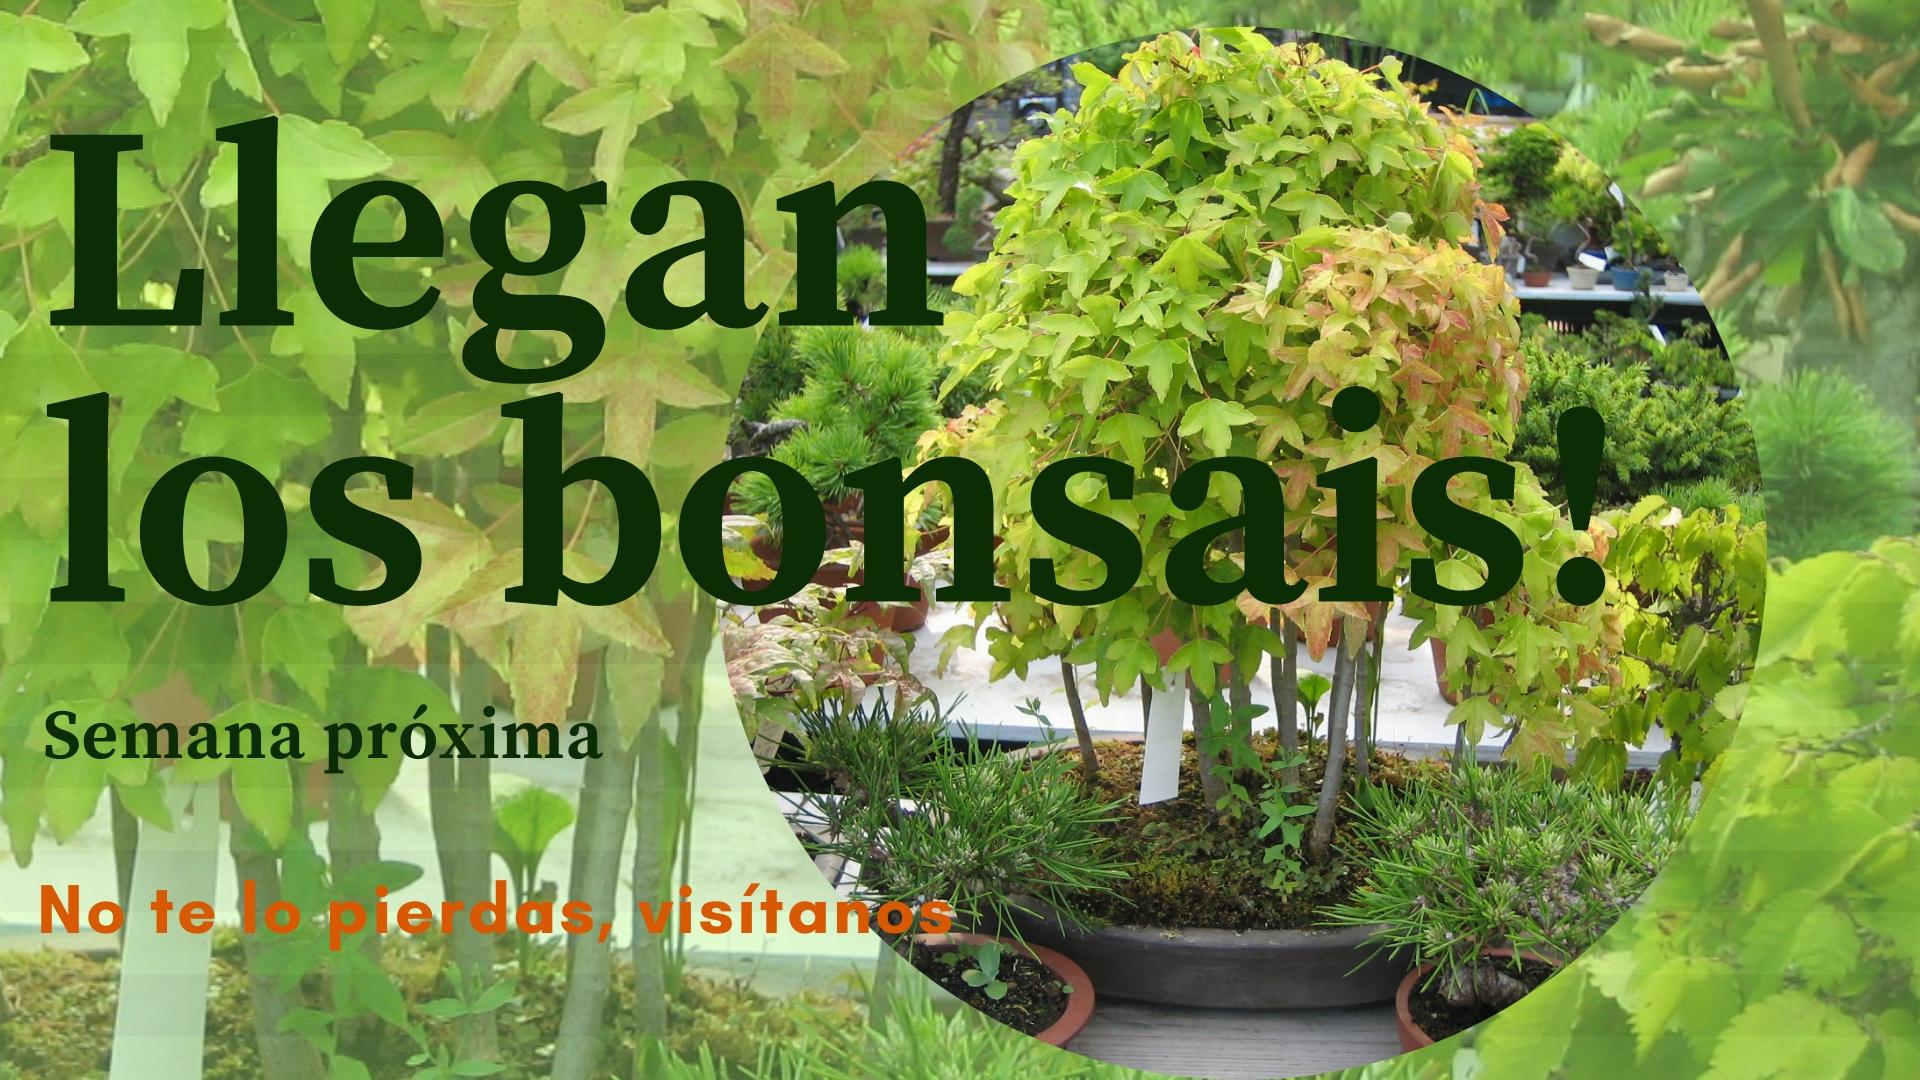 Llegan los bonsais.